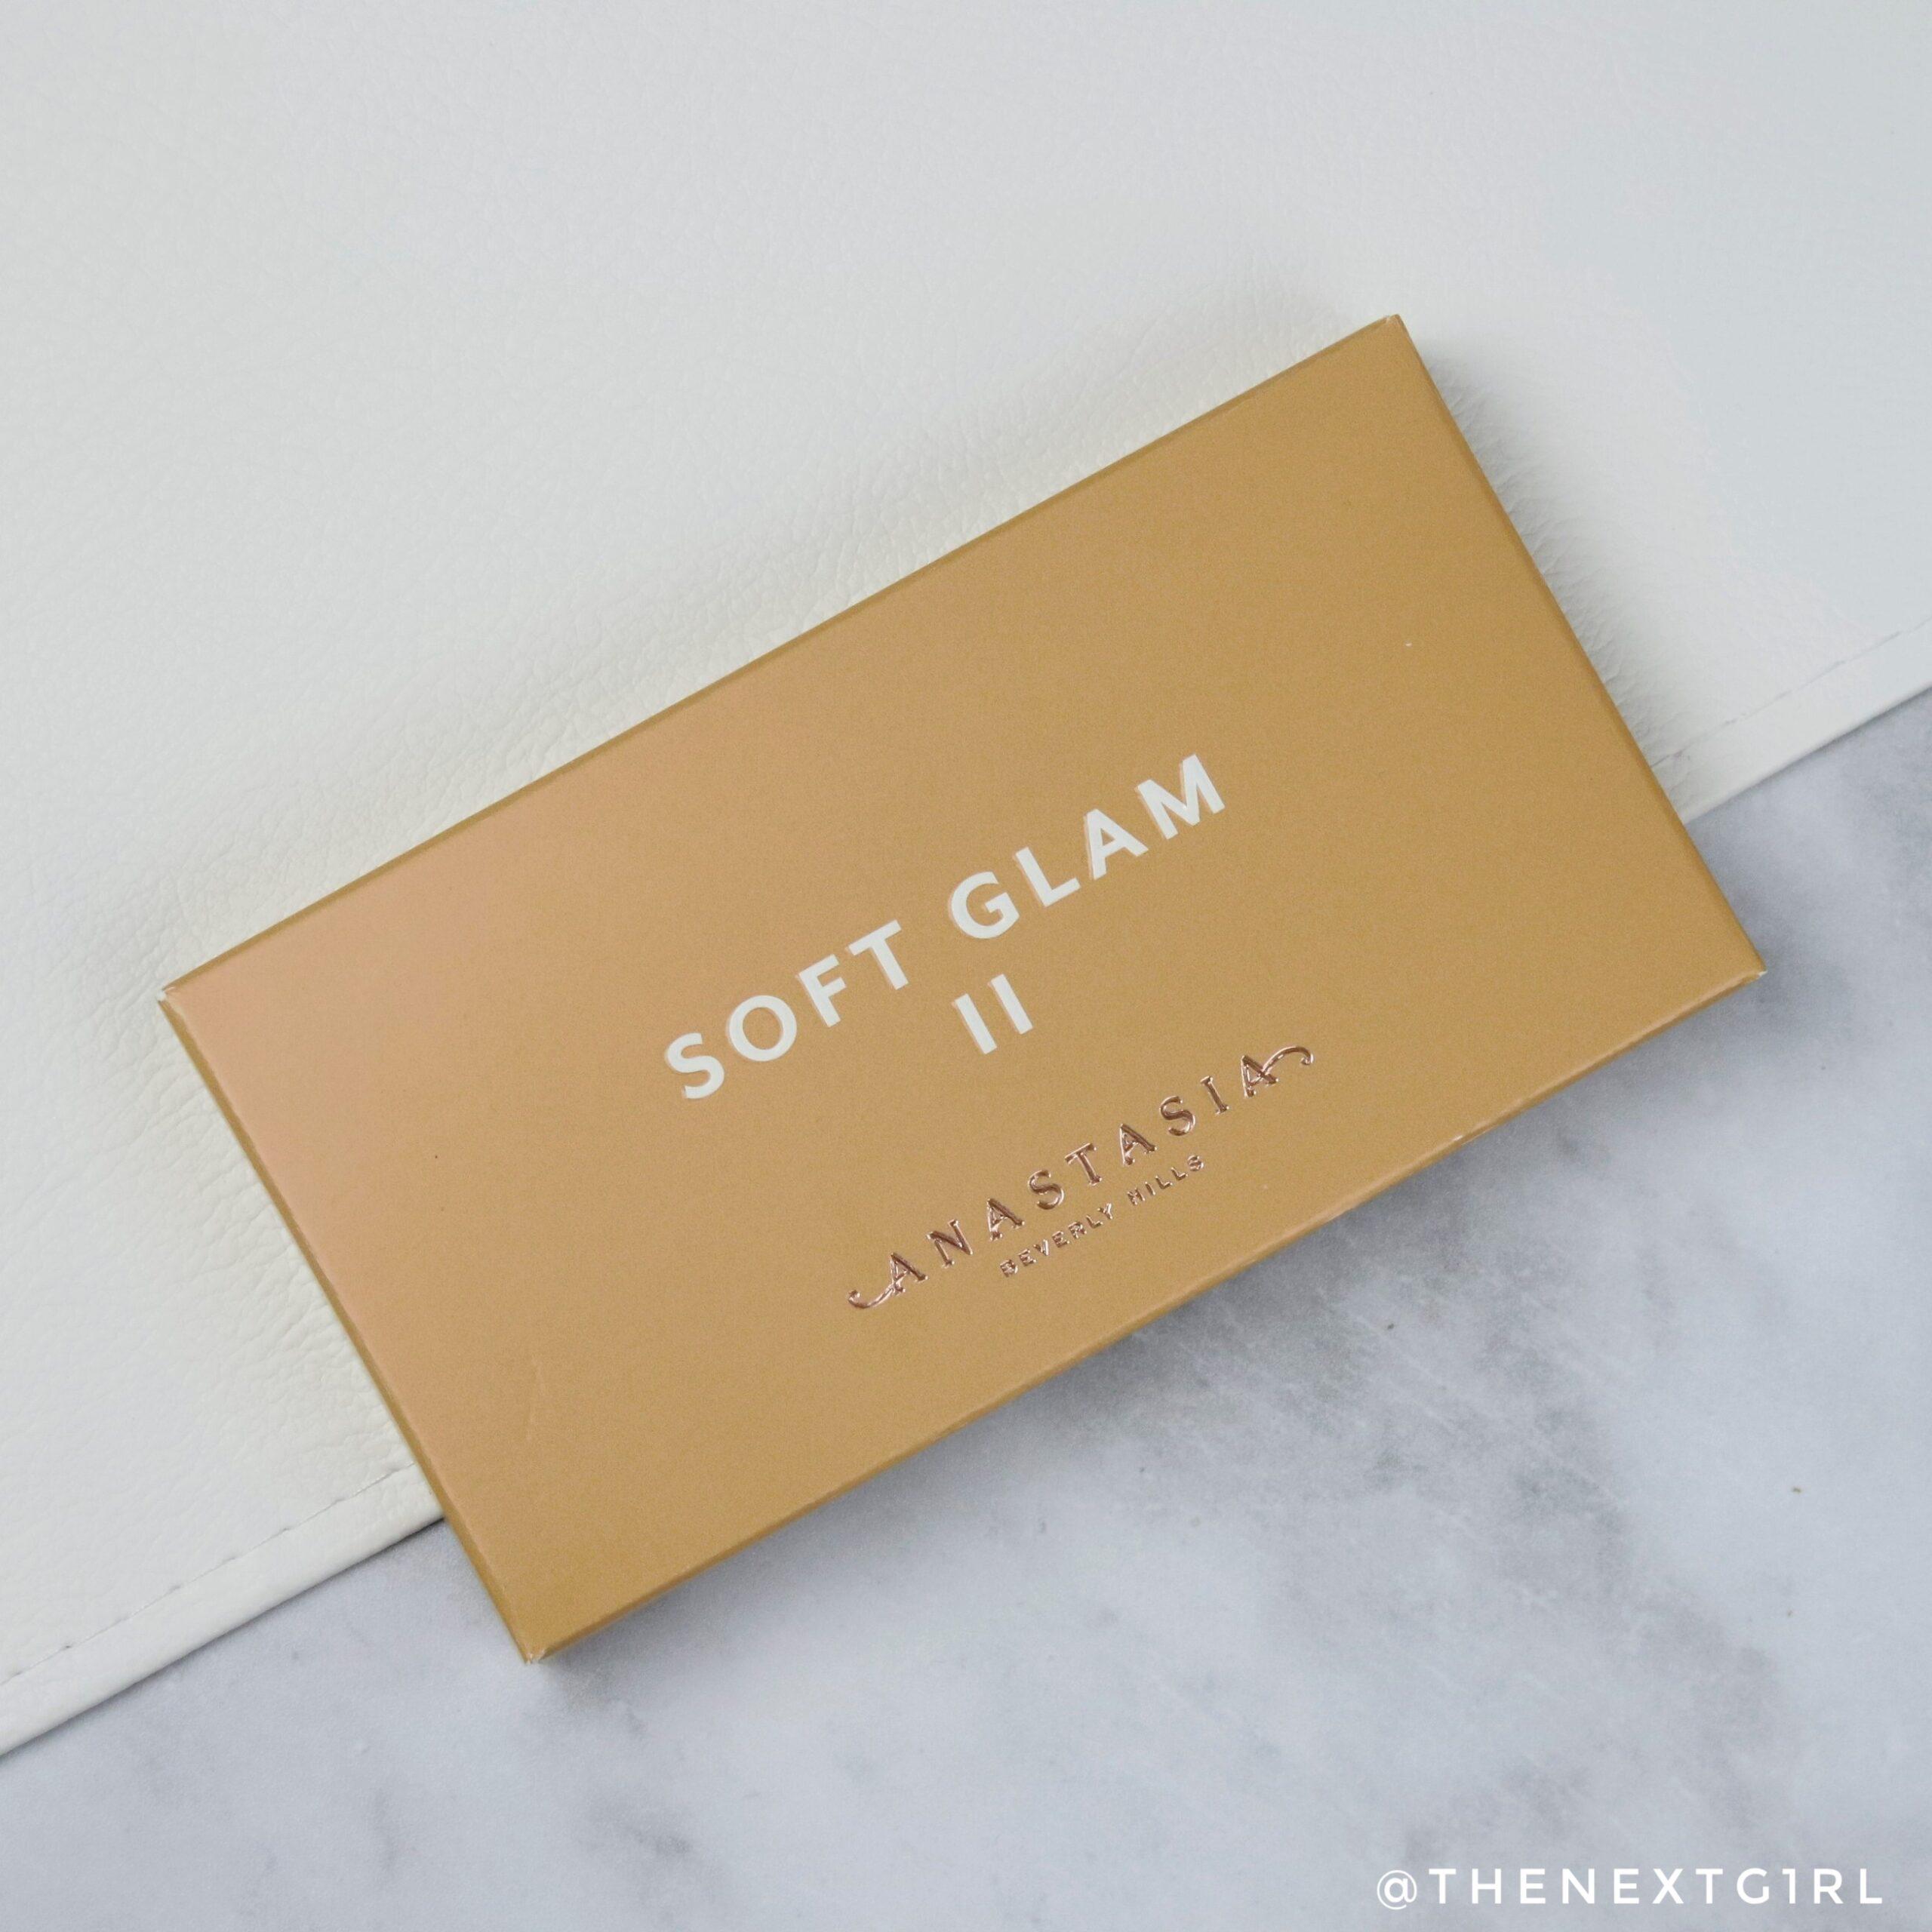 Anastasia Beverly Hills – Soft Glam 2